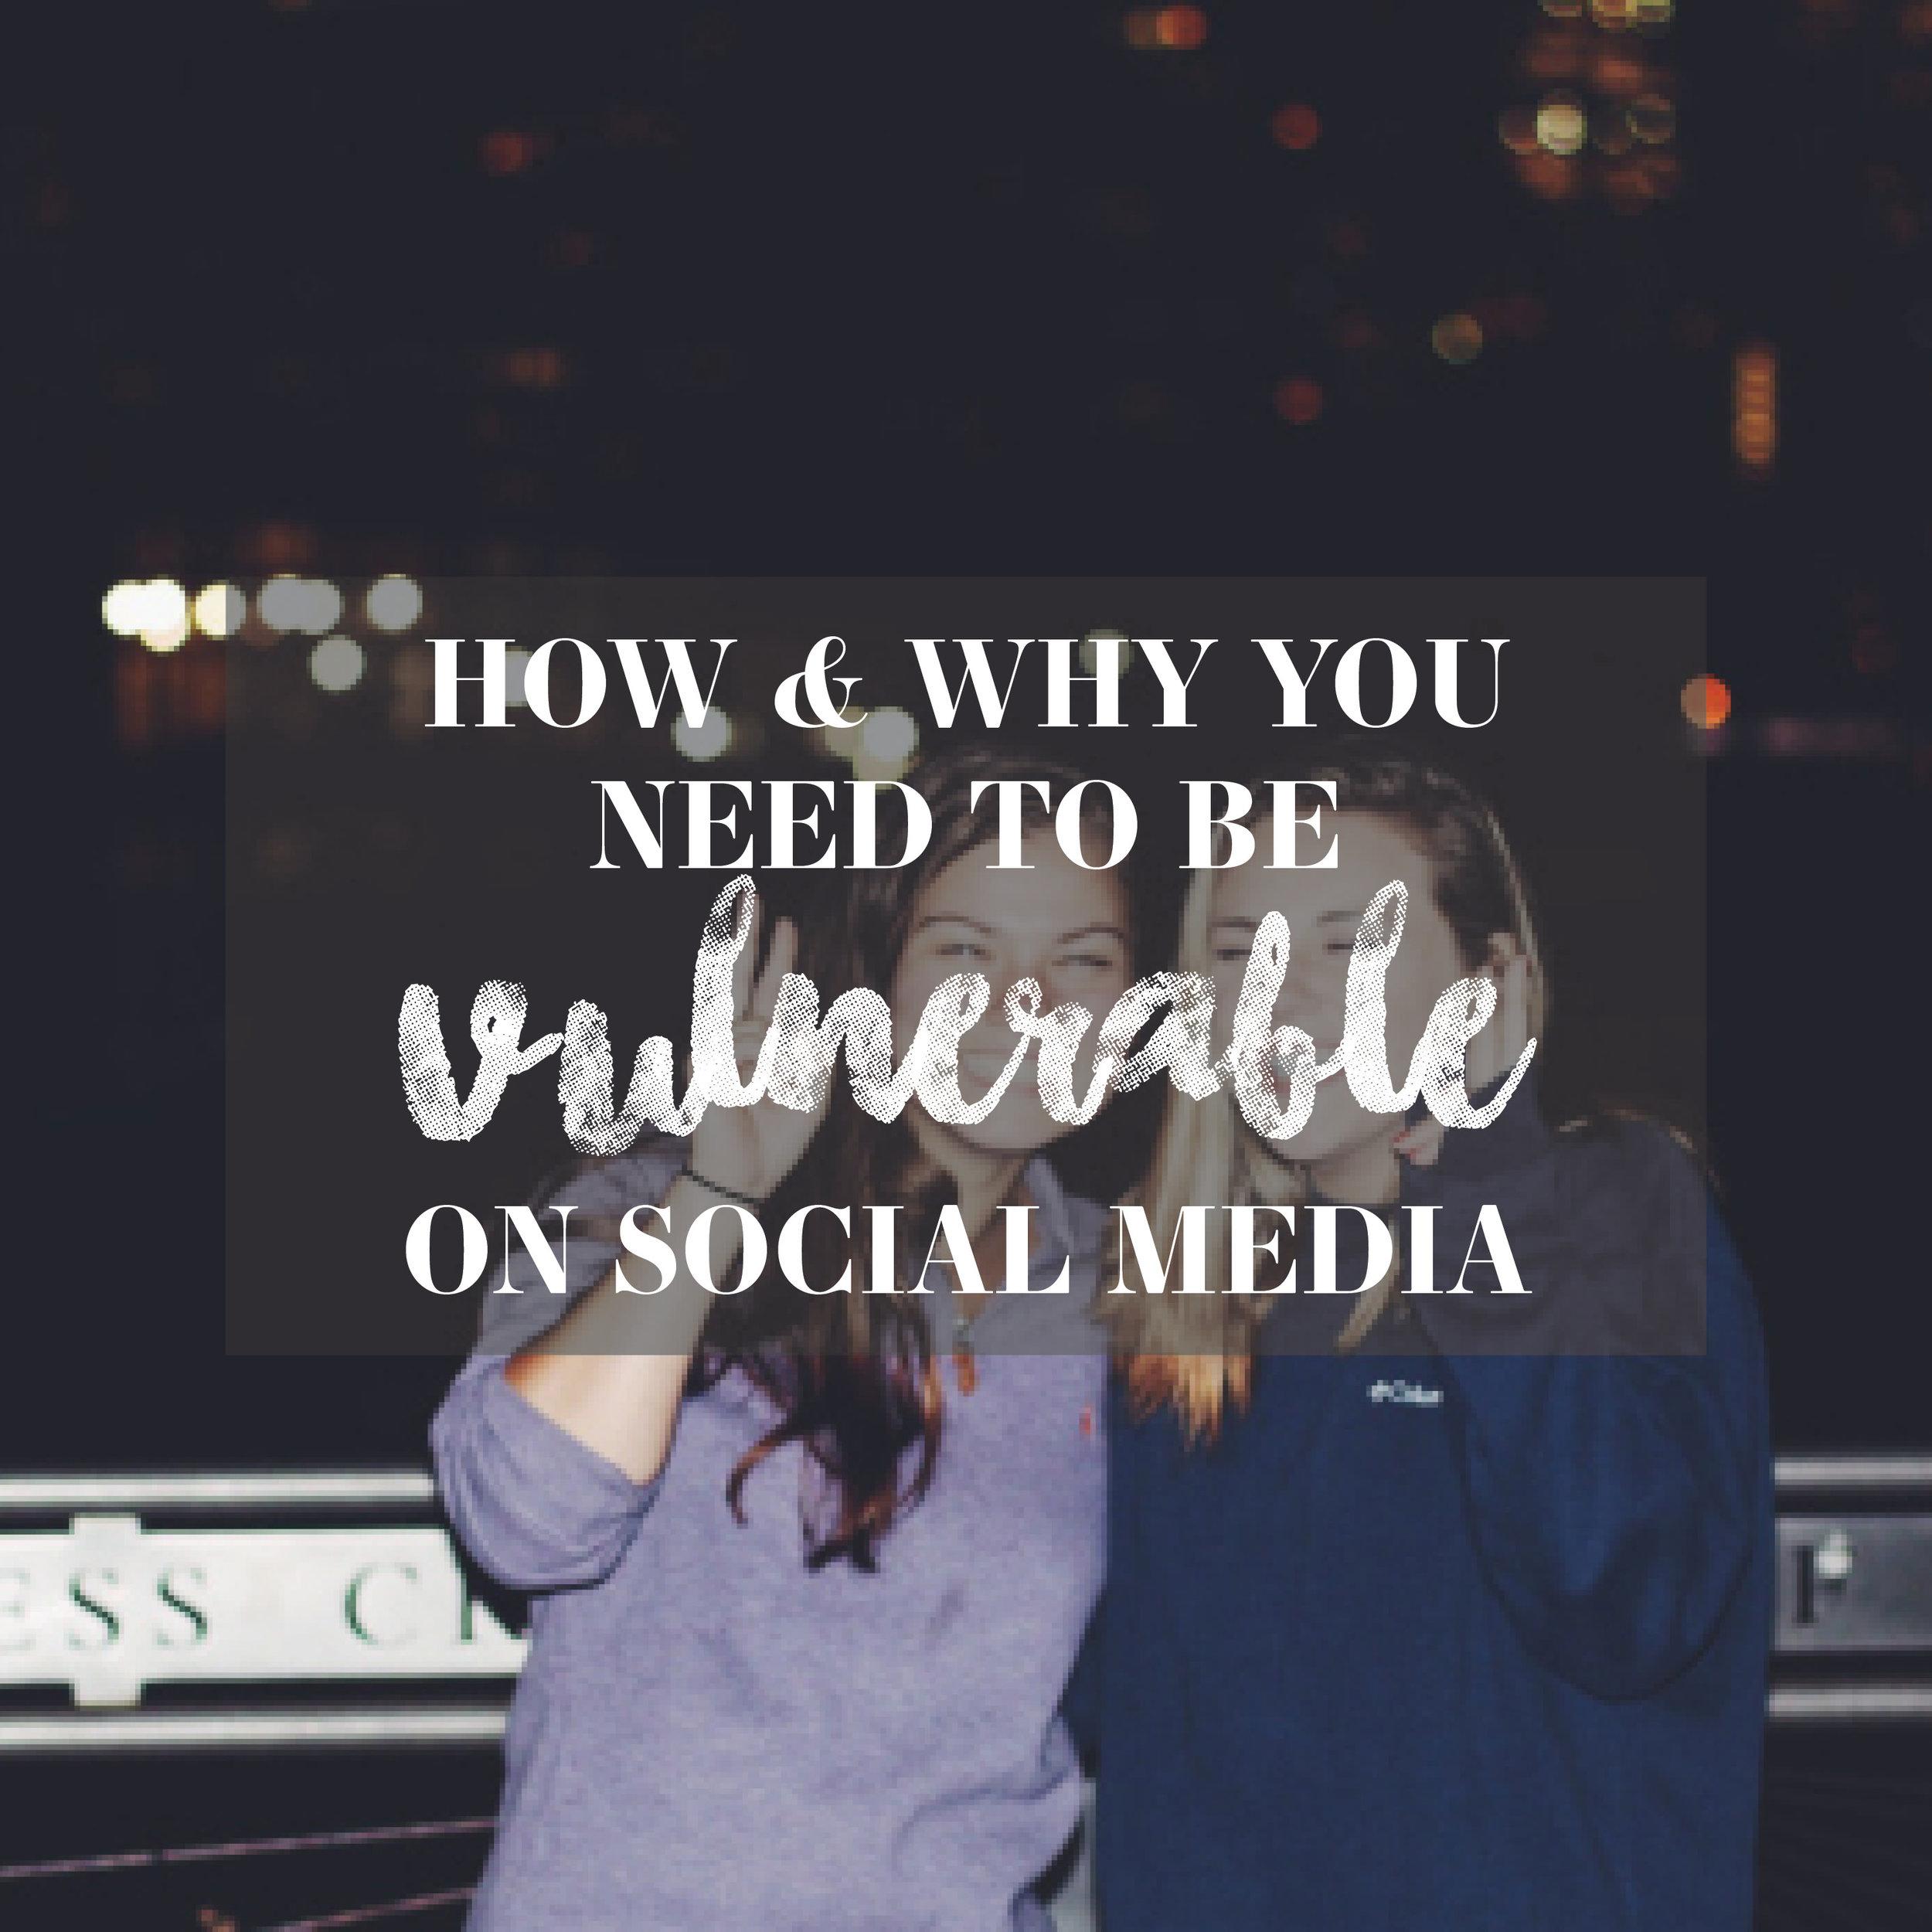 Vulnerability on Social Media